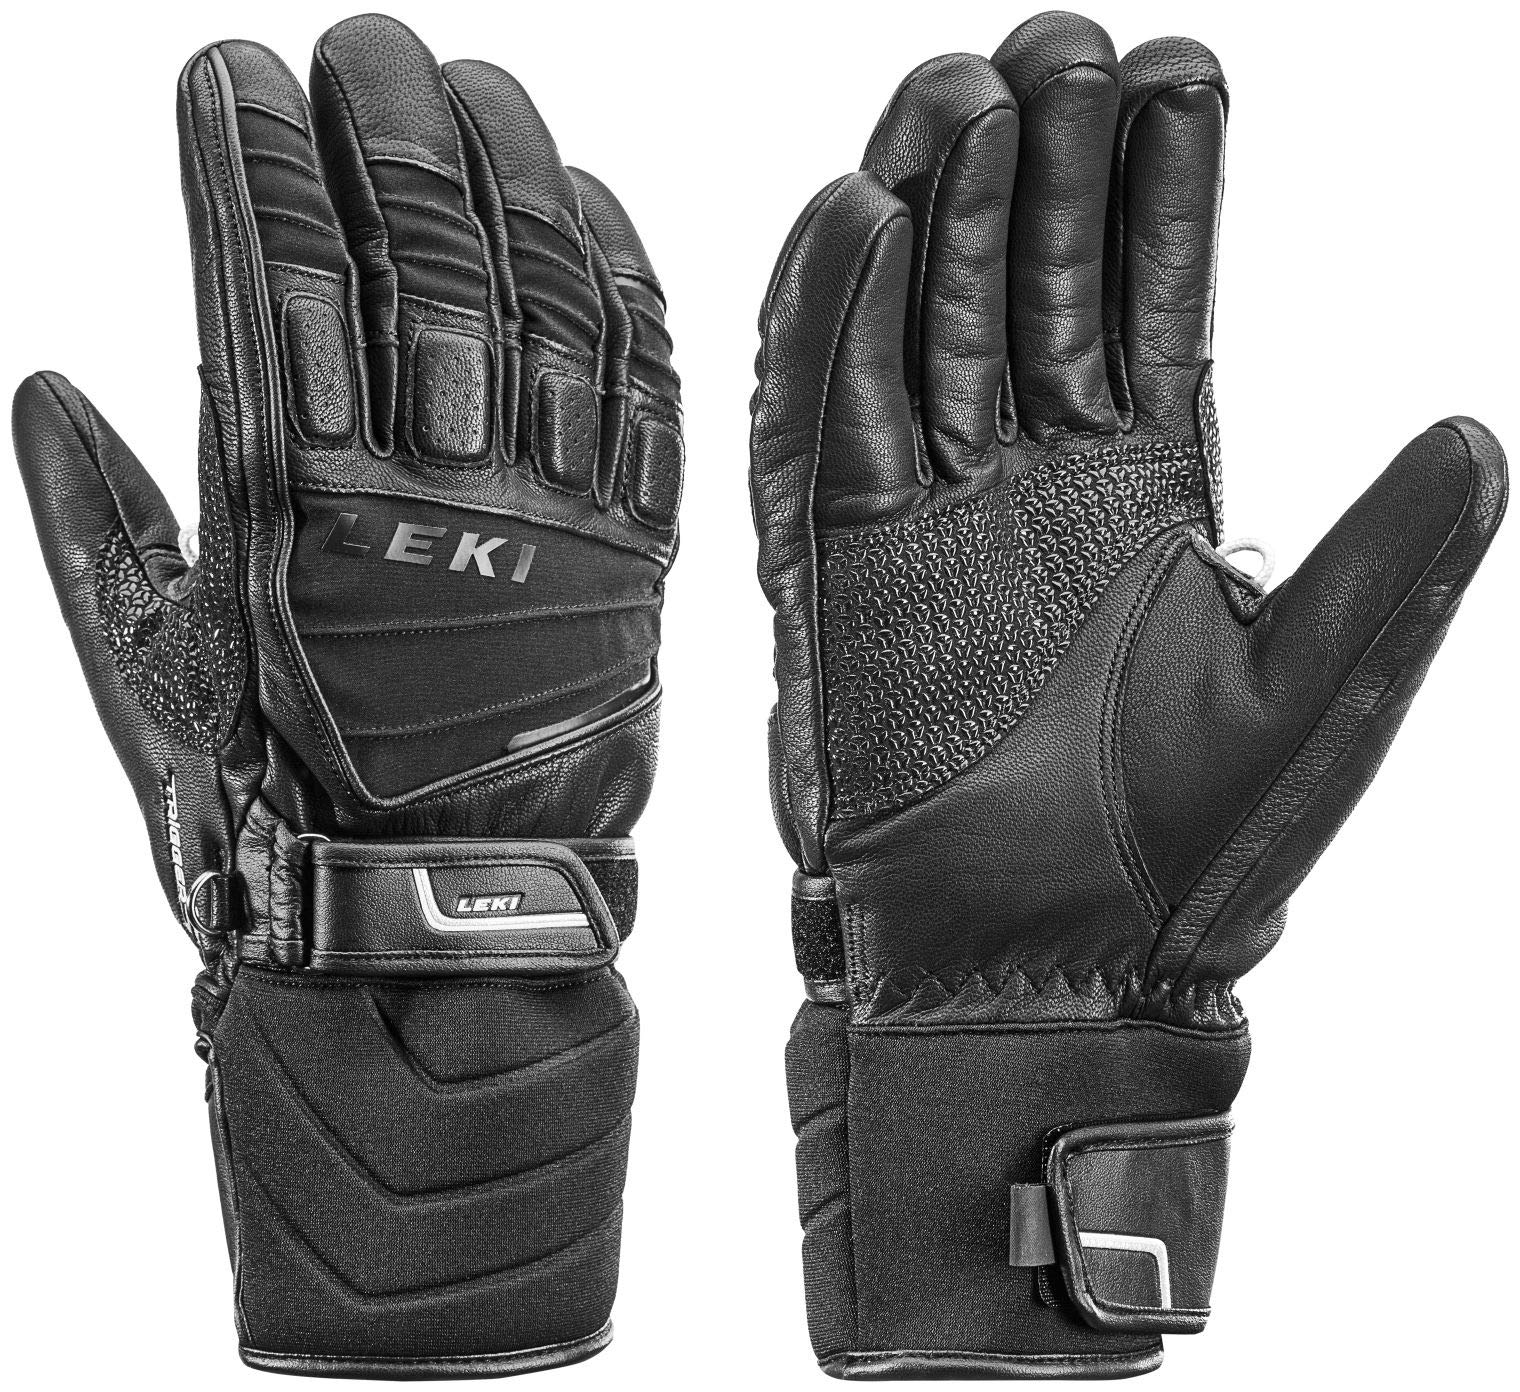 LEKI Griffin S Skiing Glove